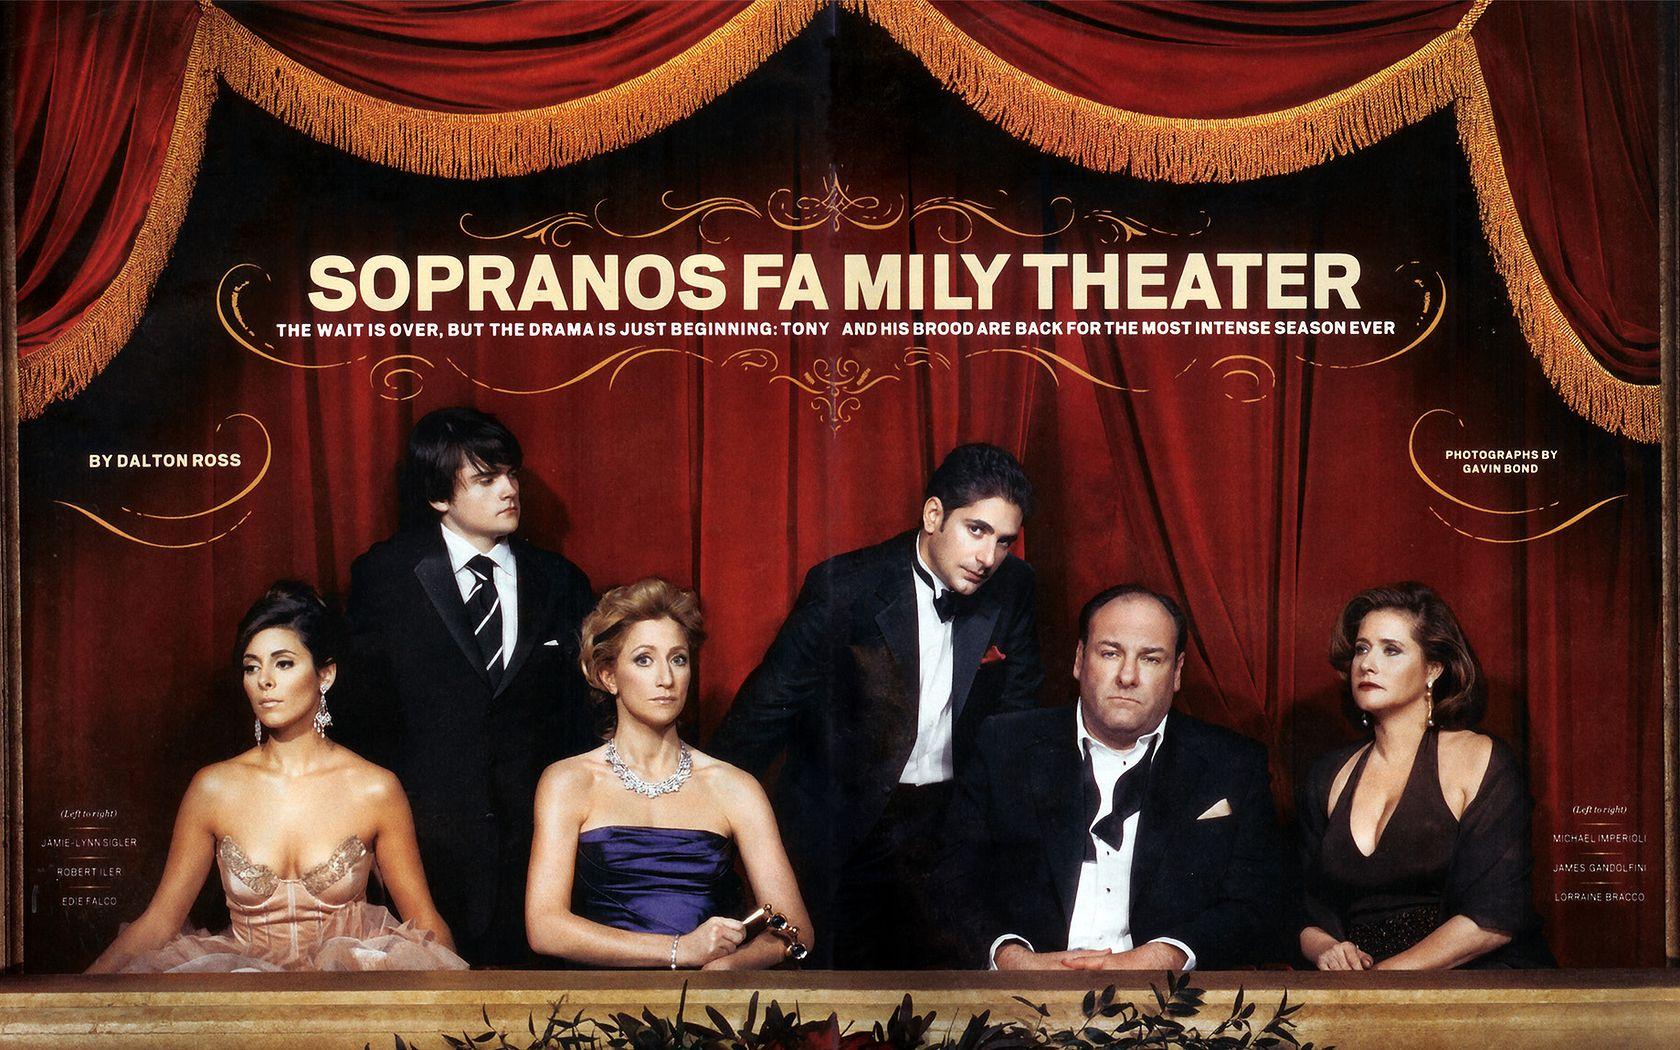 The Sopranos wallpaper 11